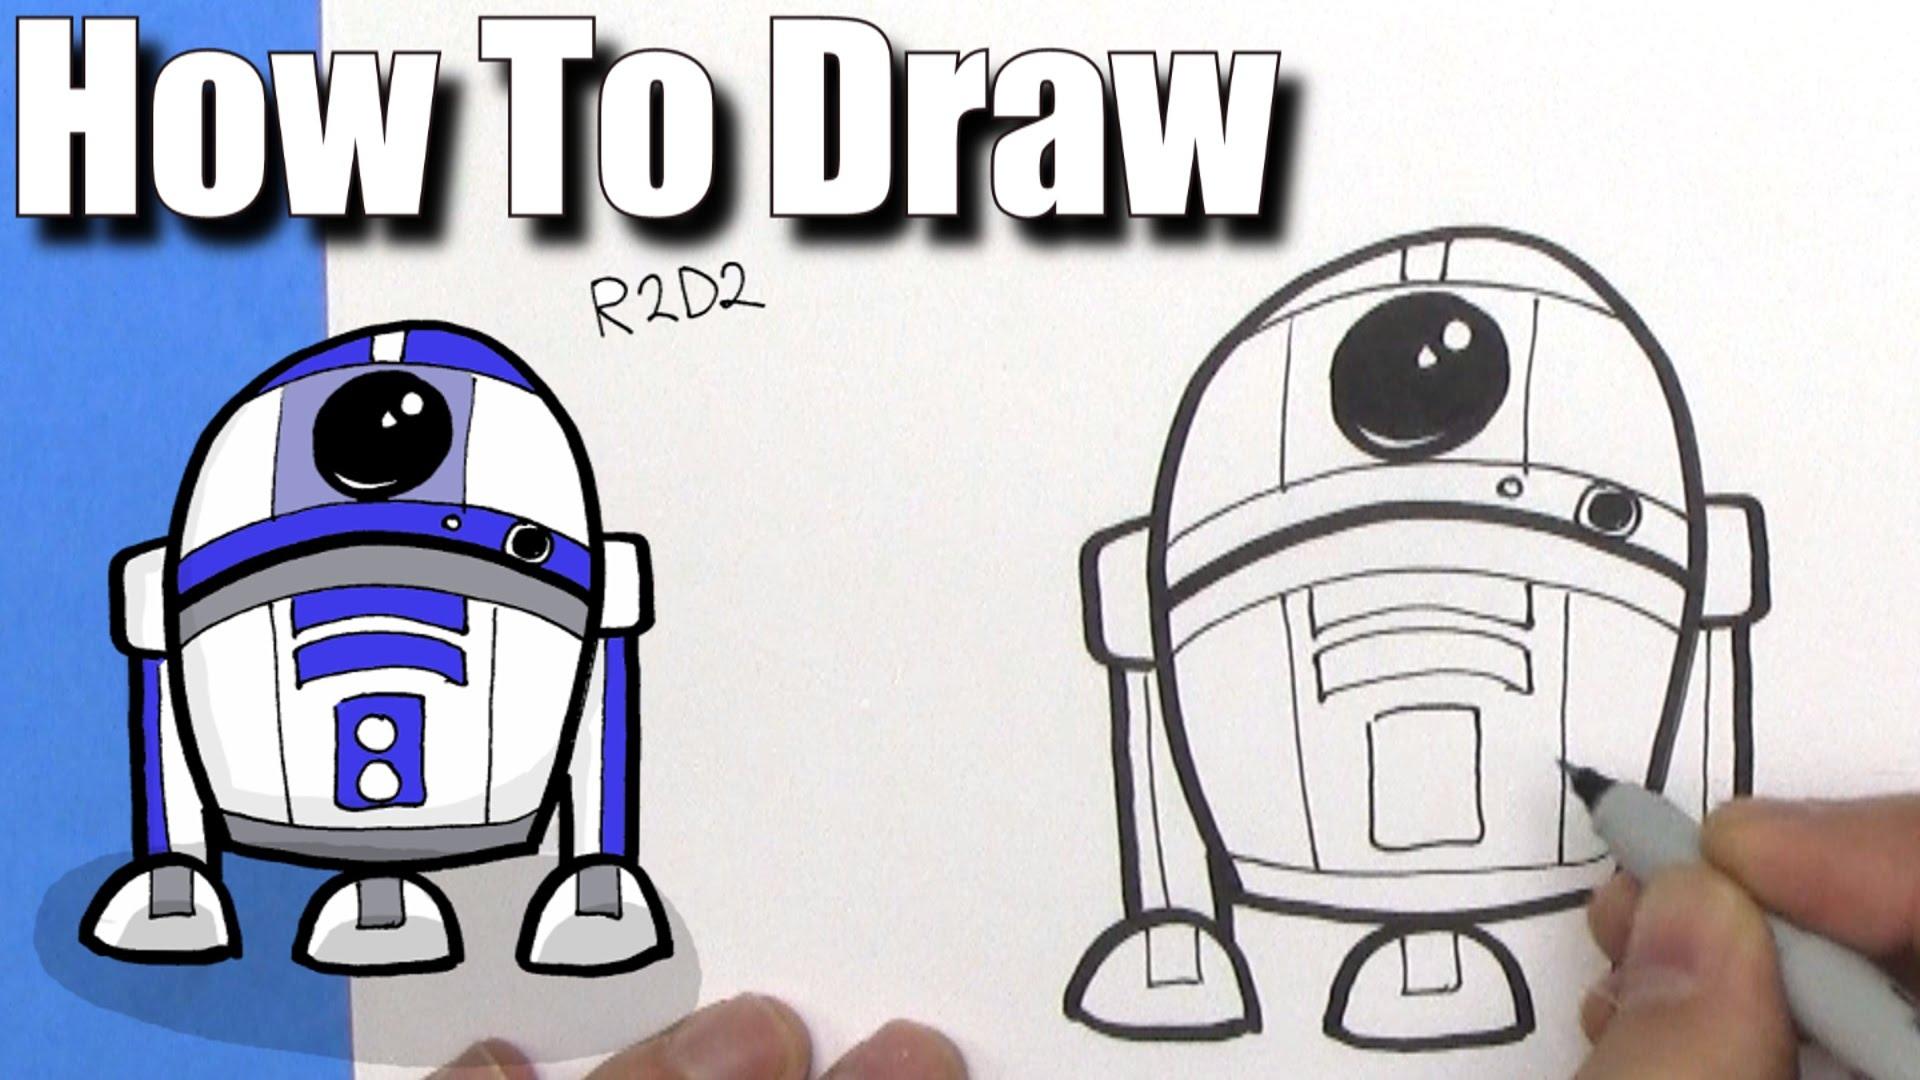 1920x1080 How To Draw Cute Cartoon R2d2 Droid